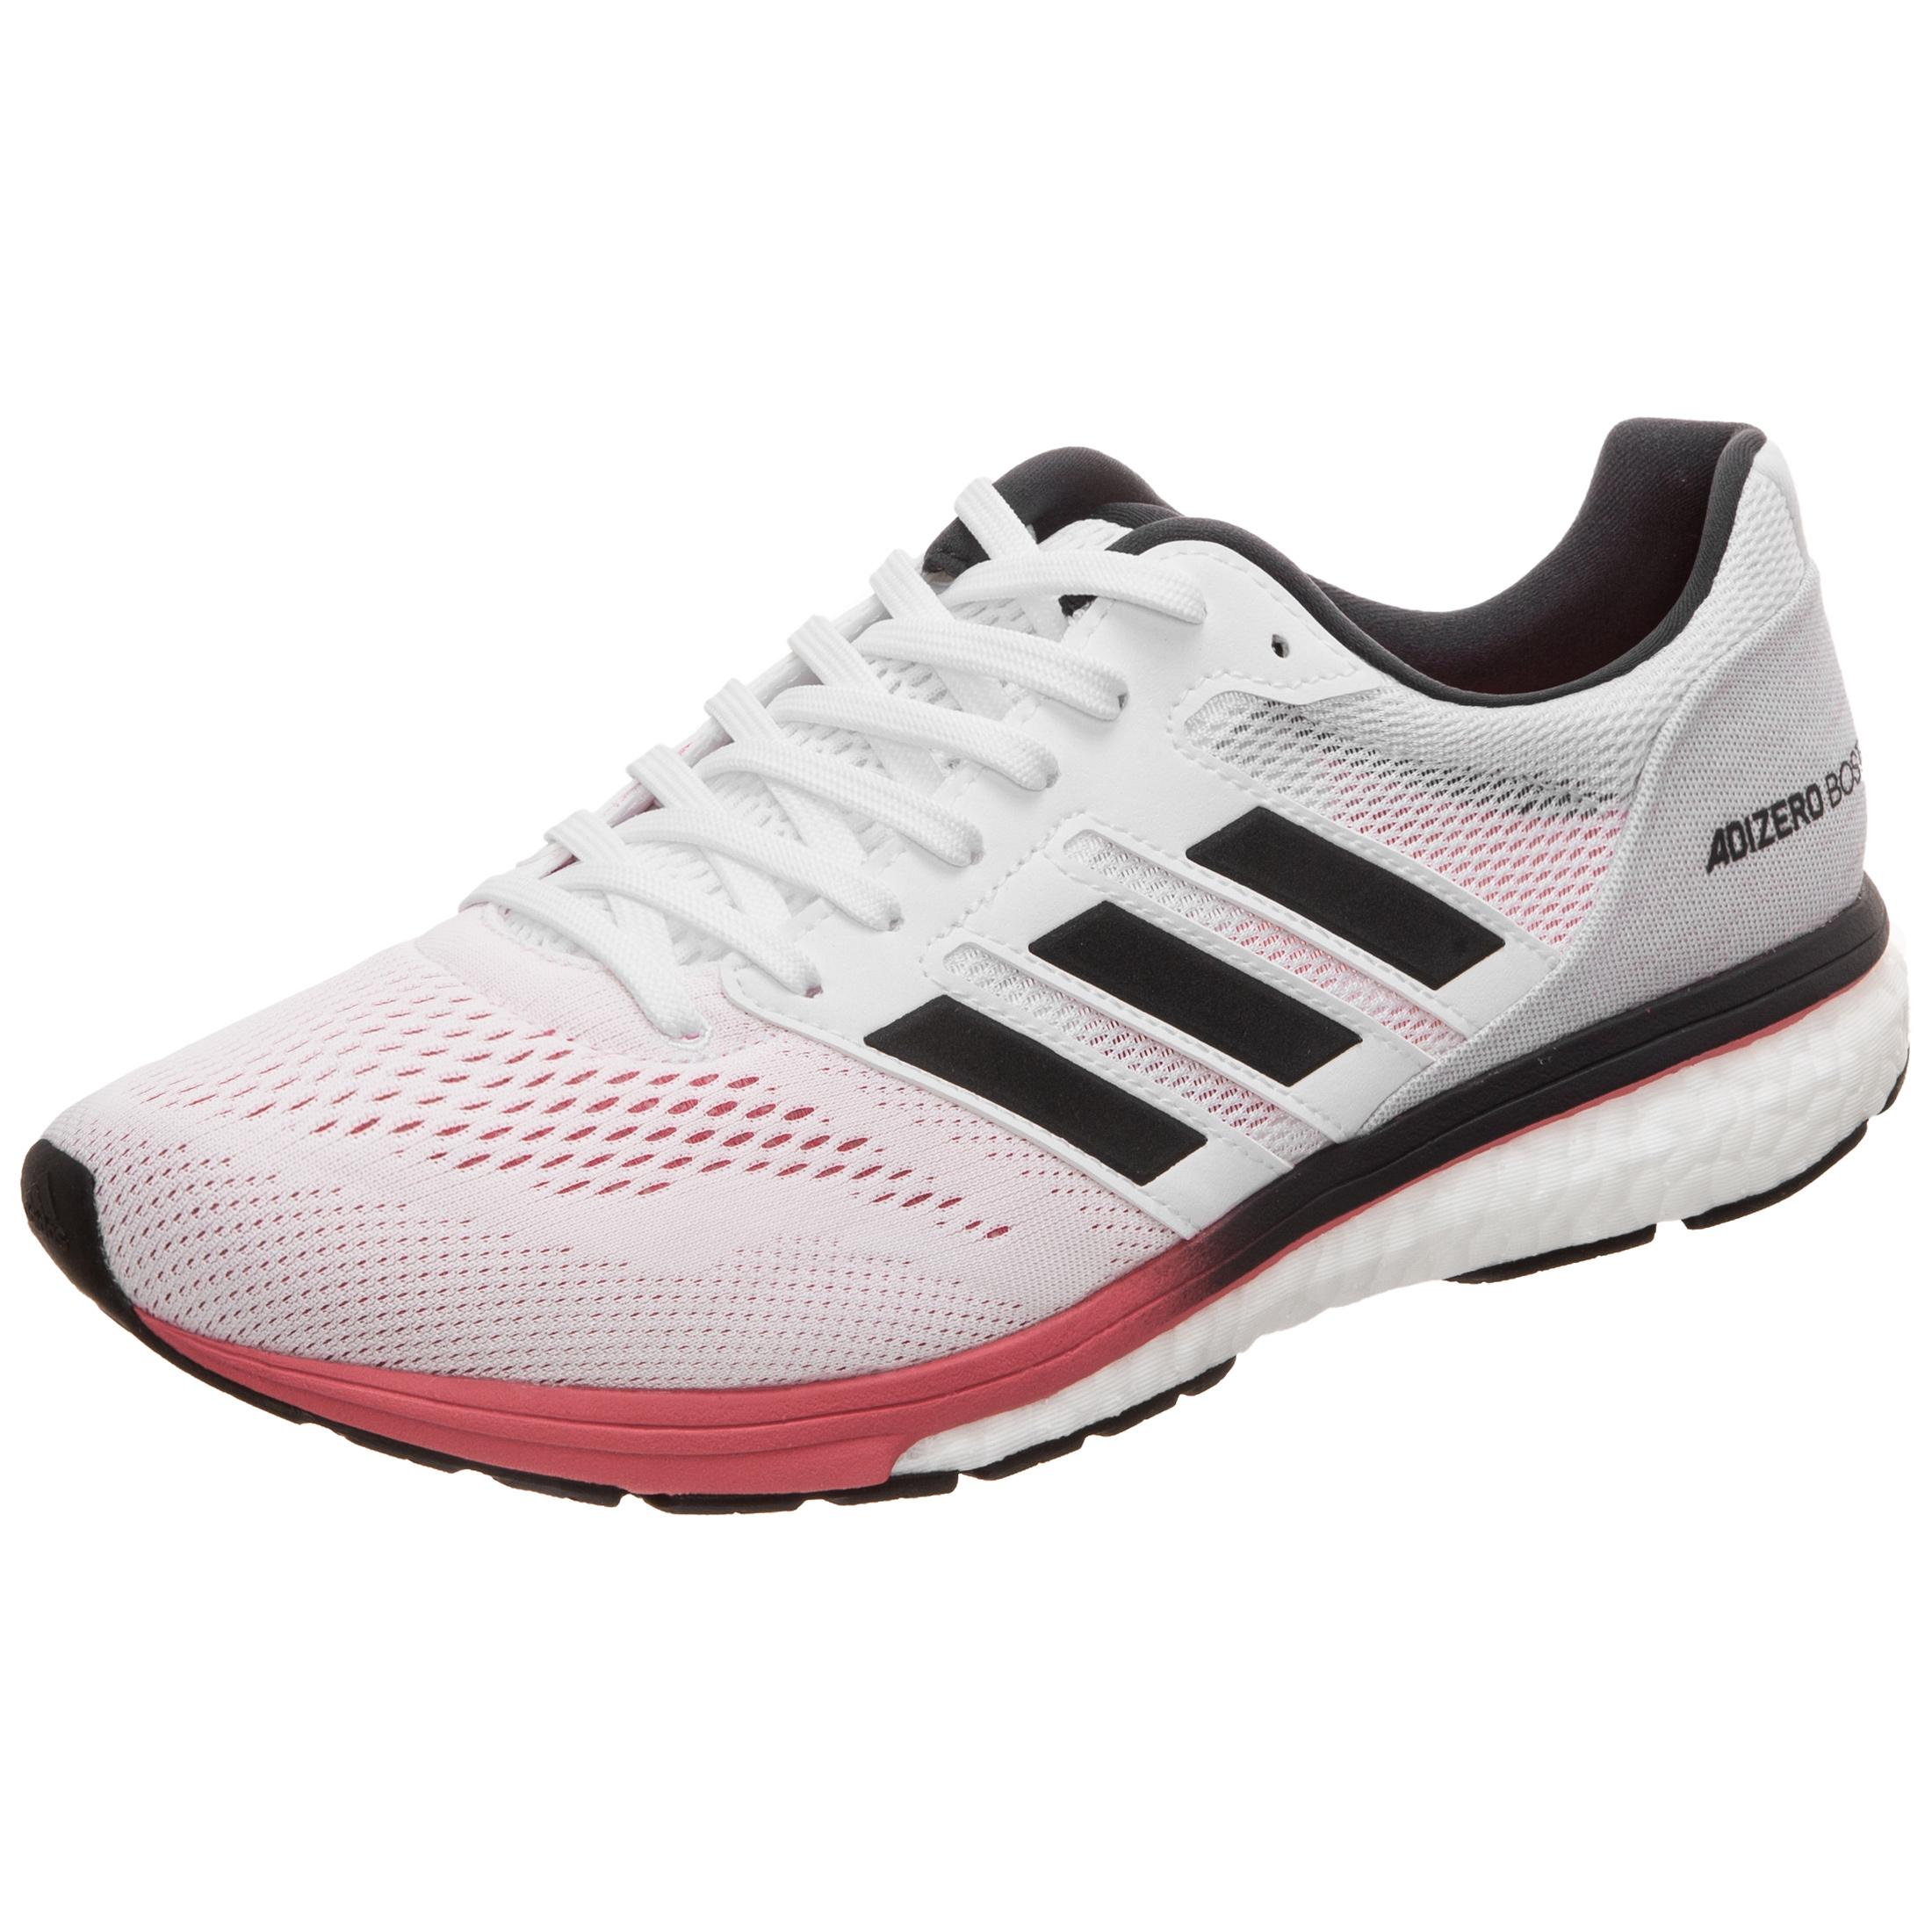 adidas Adizero Boston 7 Laufschuhe | B37386 | Sport Klingenmaier